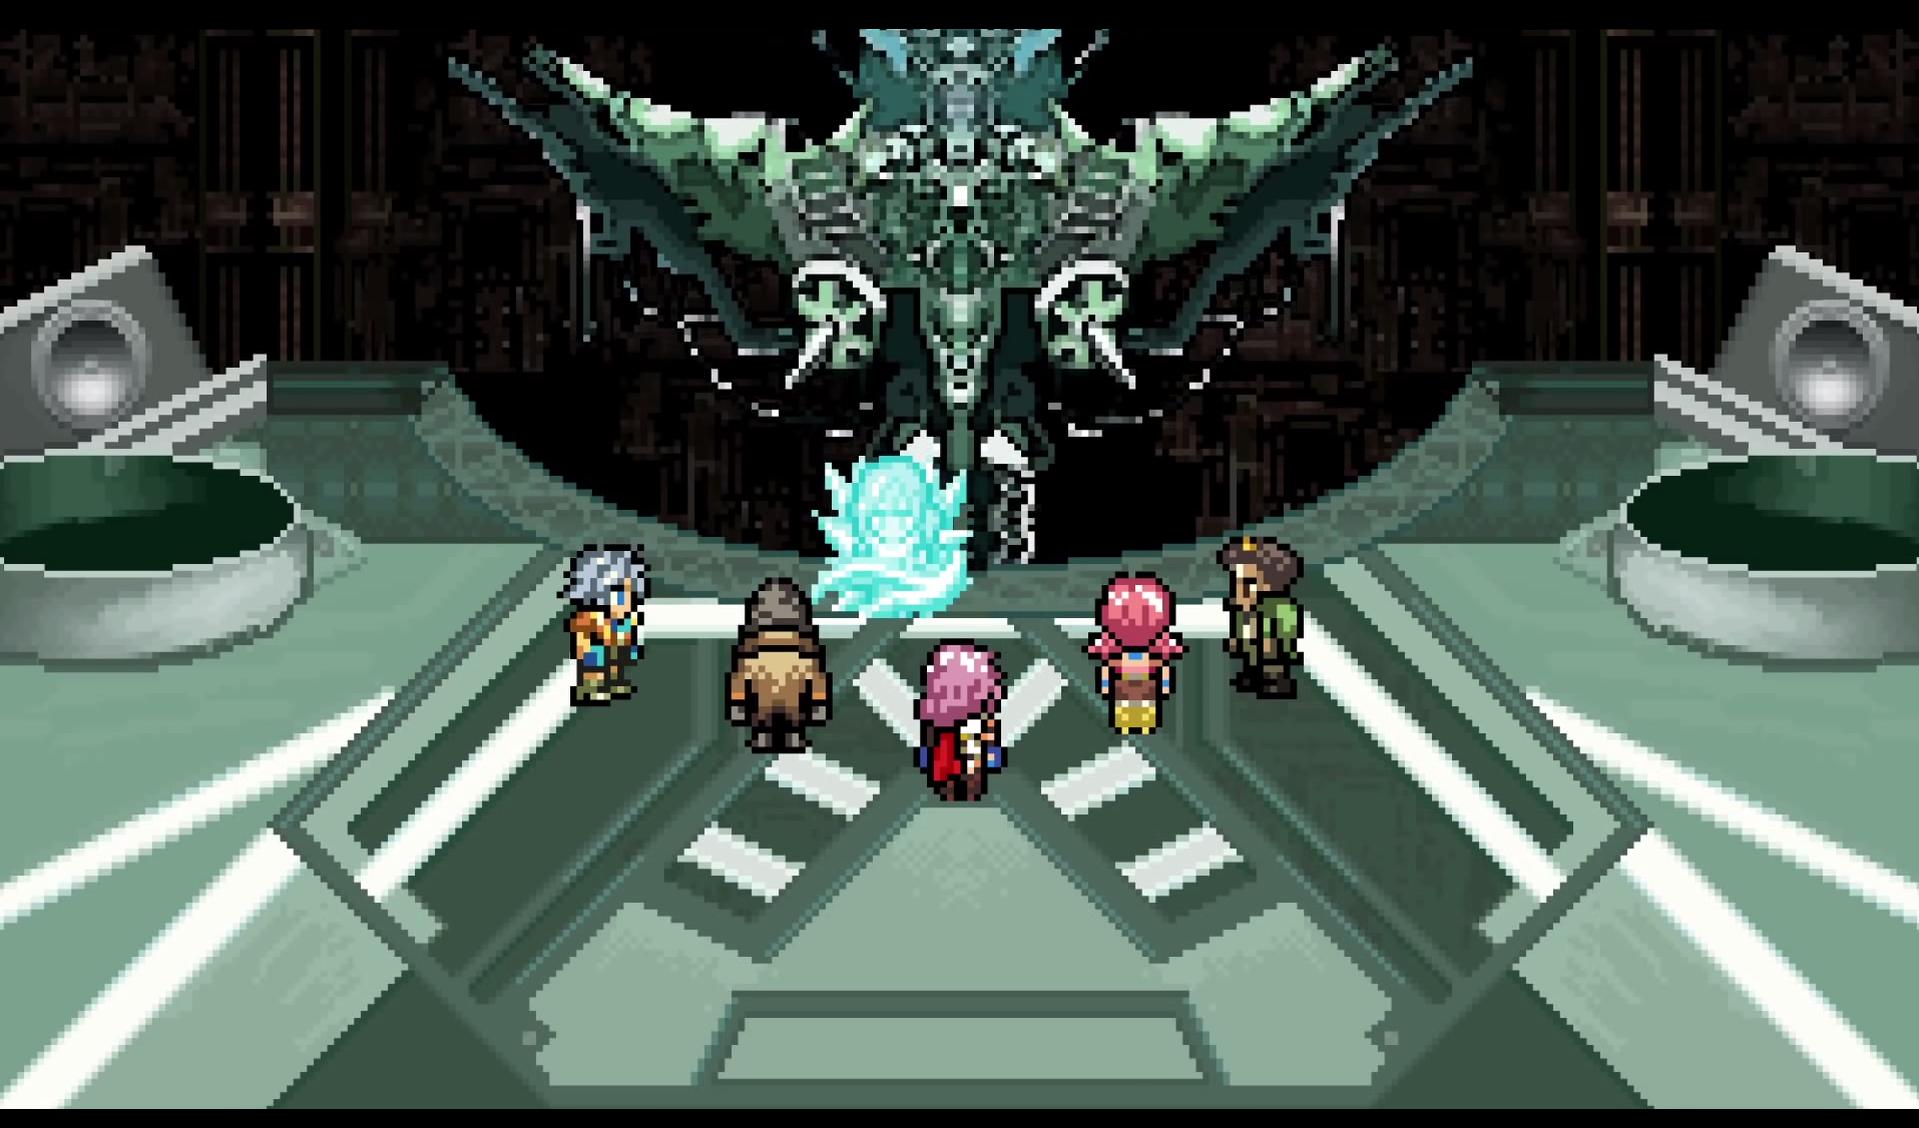 Ffinal Fantasy XIII Rétro 16 Bits